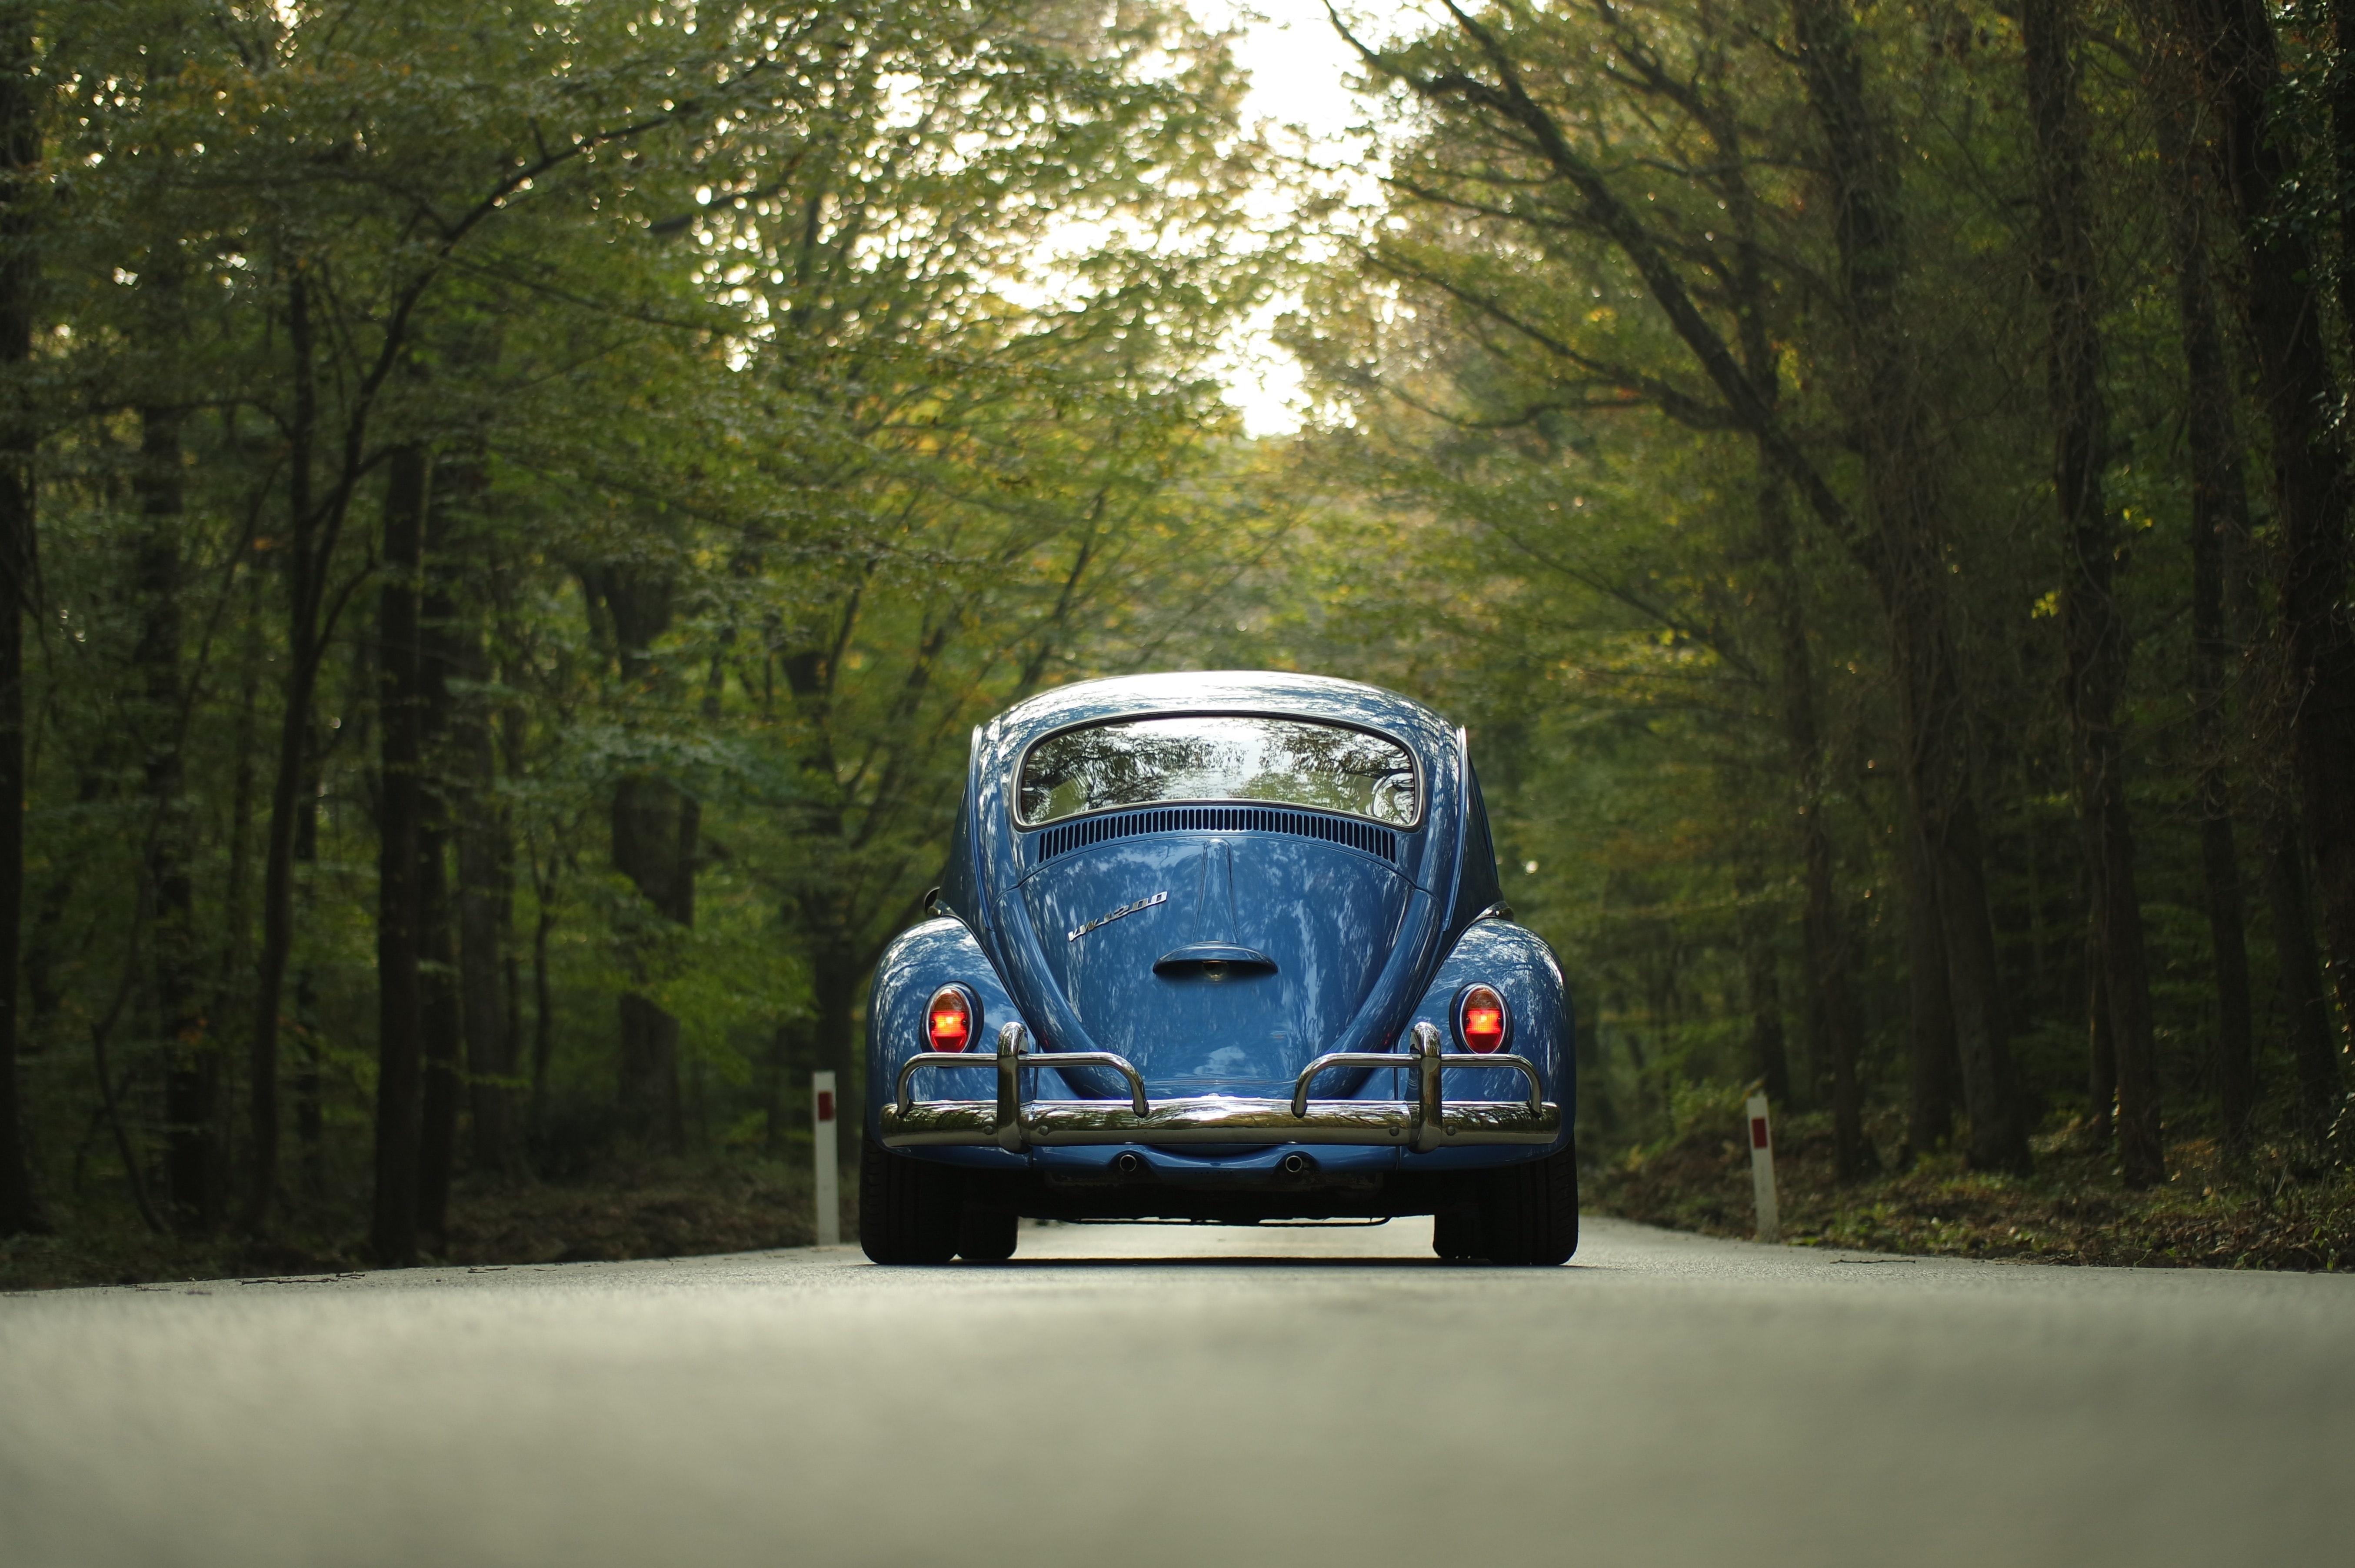 car-classic-car-forest-105032